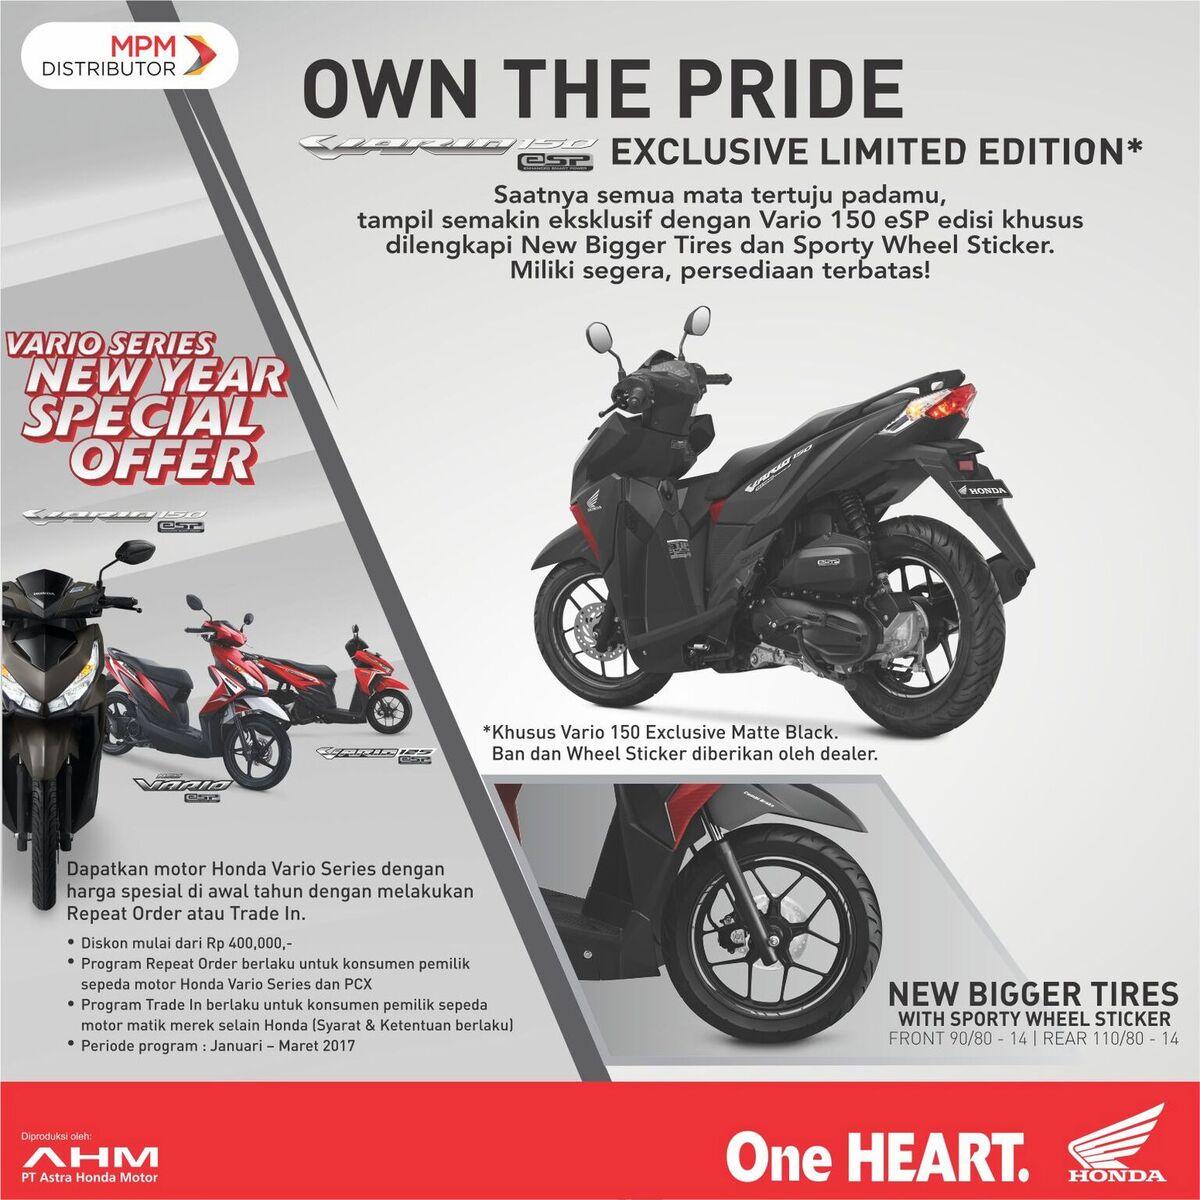 Harga Jual Sepeda Motor Honda Vario Gambar 125 New 110 Esp Cbs Iss Grande White Tangerang Infojember On Twitter Upgrade Tampilan Kamu Dg 150 Exclusive Limited Edition With Bigger